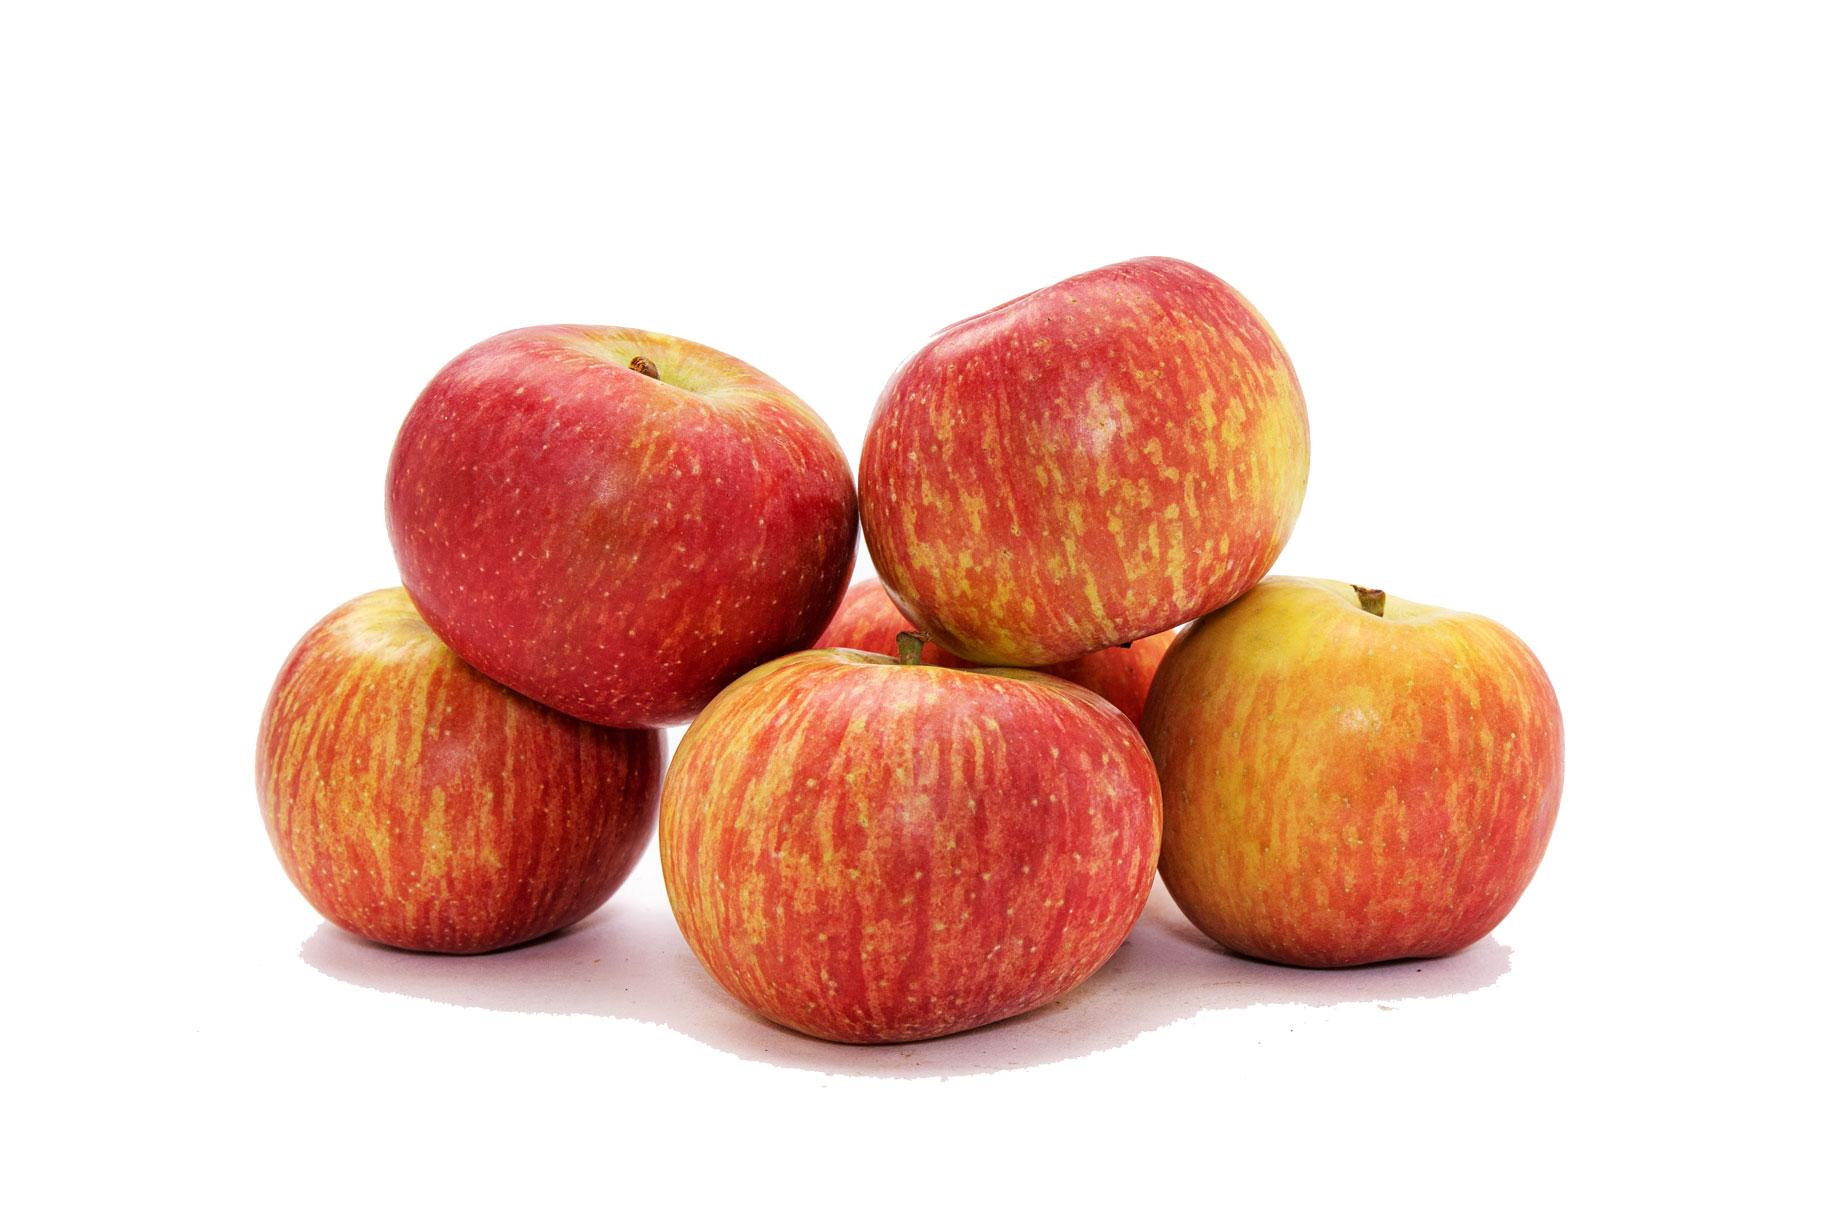 apple-red-fuji-multi-yypy